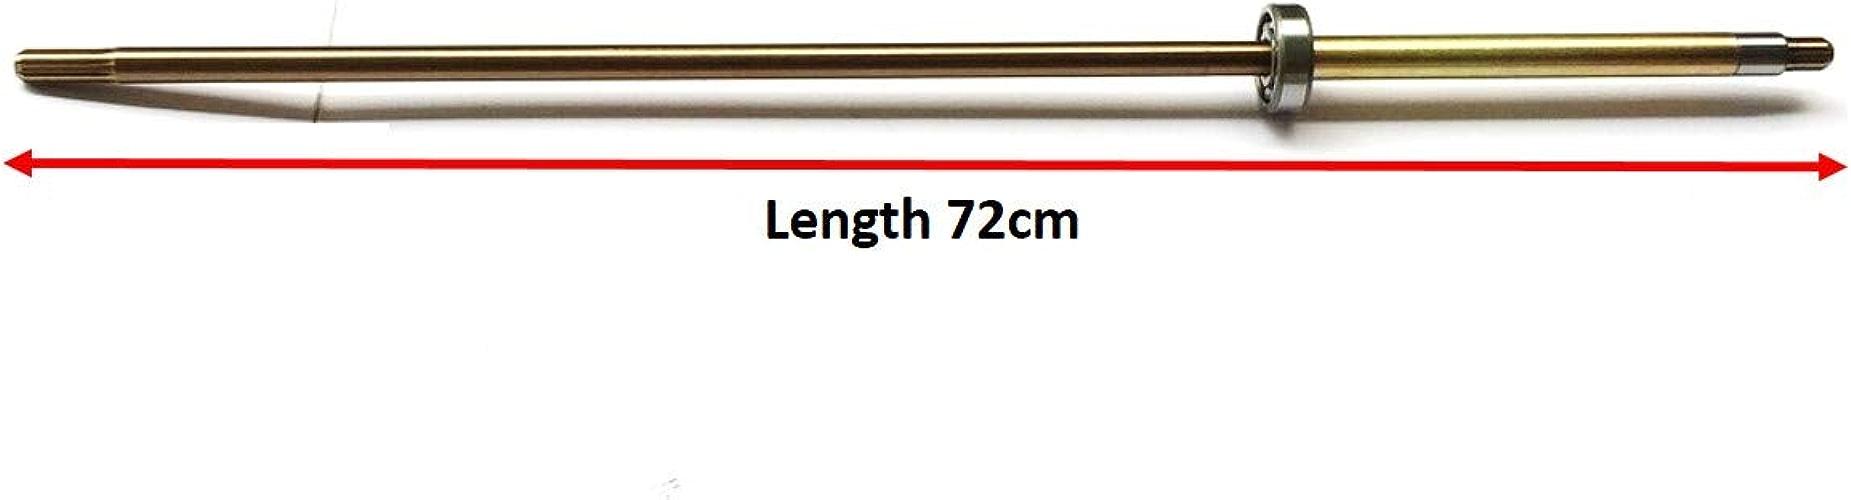 YAMASCO 3B2-64302-0 3B2643071M Arbre d'entraîneHommest (L) pour Tohatsu Nissan Hors-Bord 8HP 9.8 HP 2 4